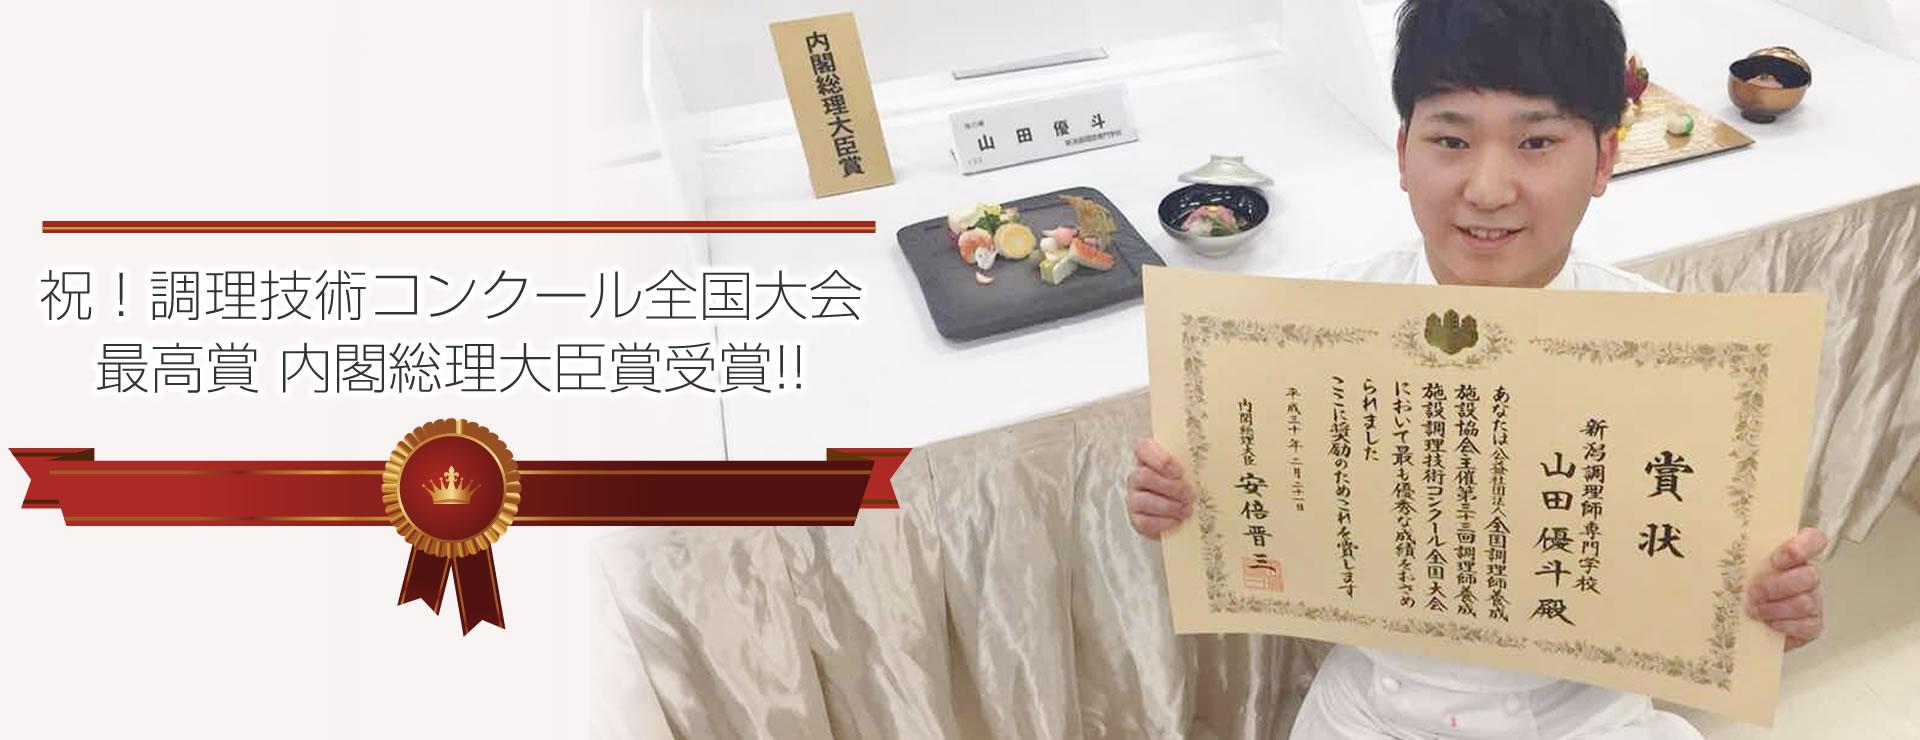 祝!調理技術コンクール全国大会 最高賞 内閣総理大臣賞受賞!!